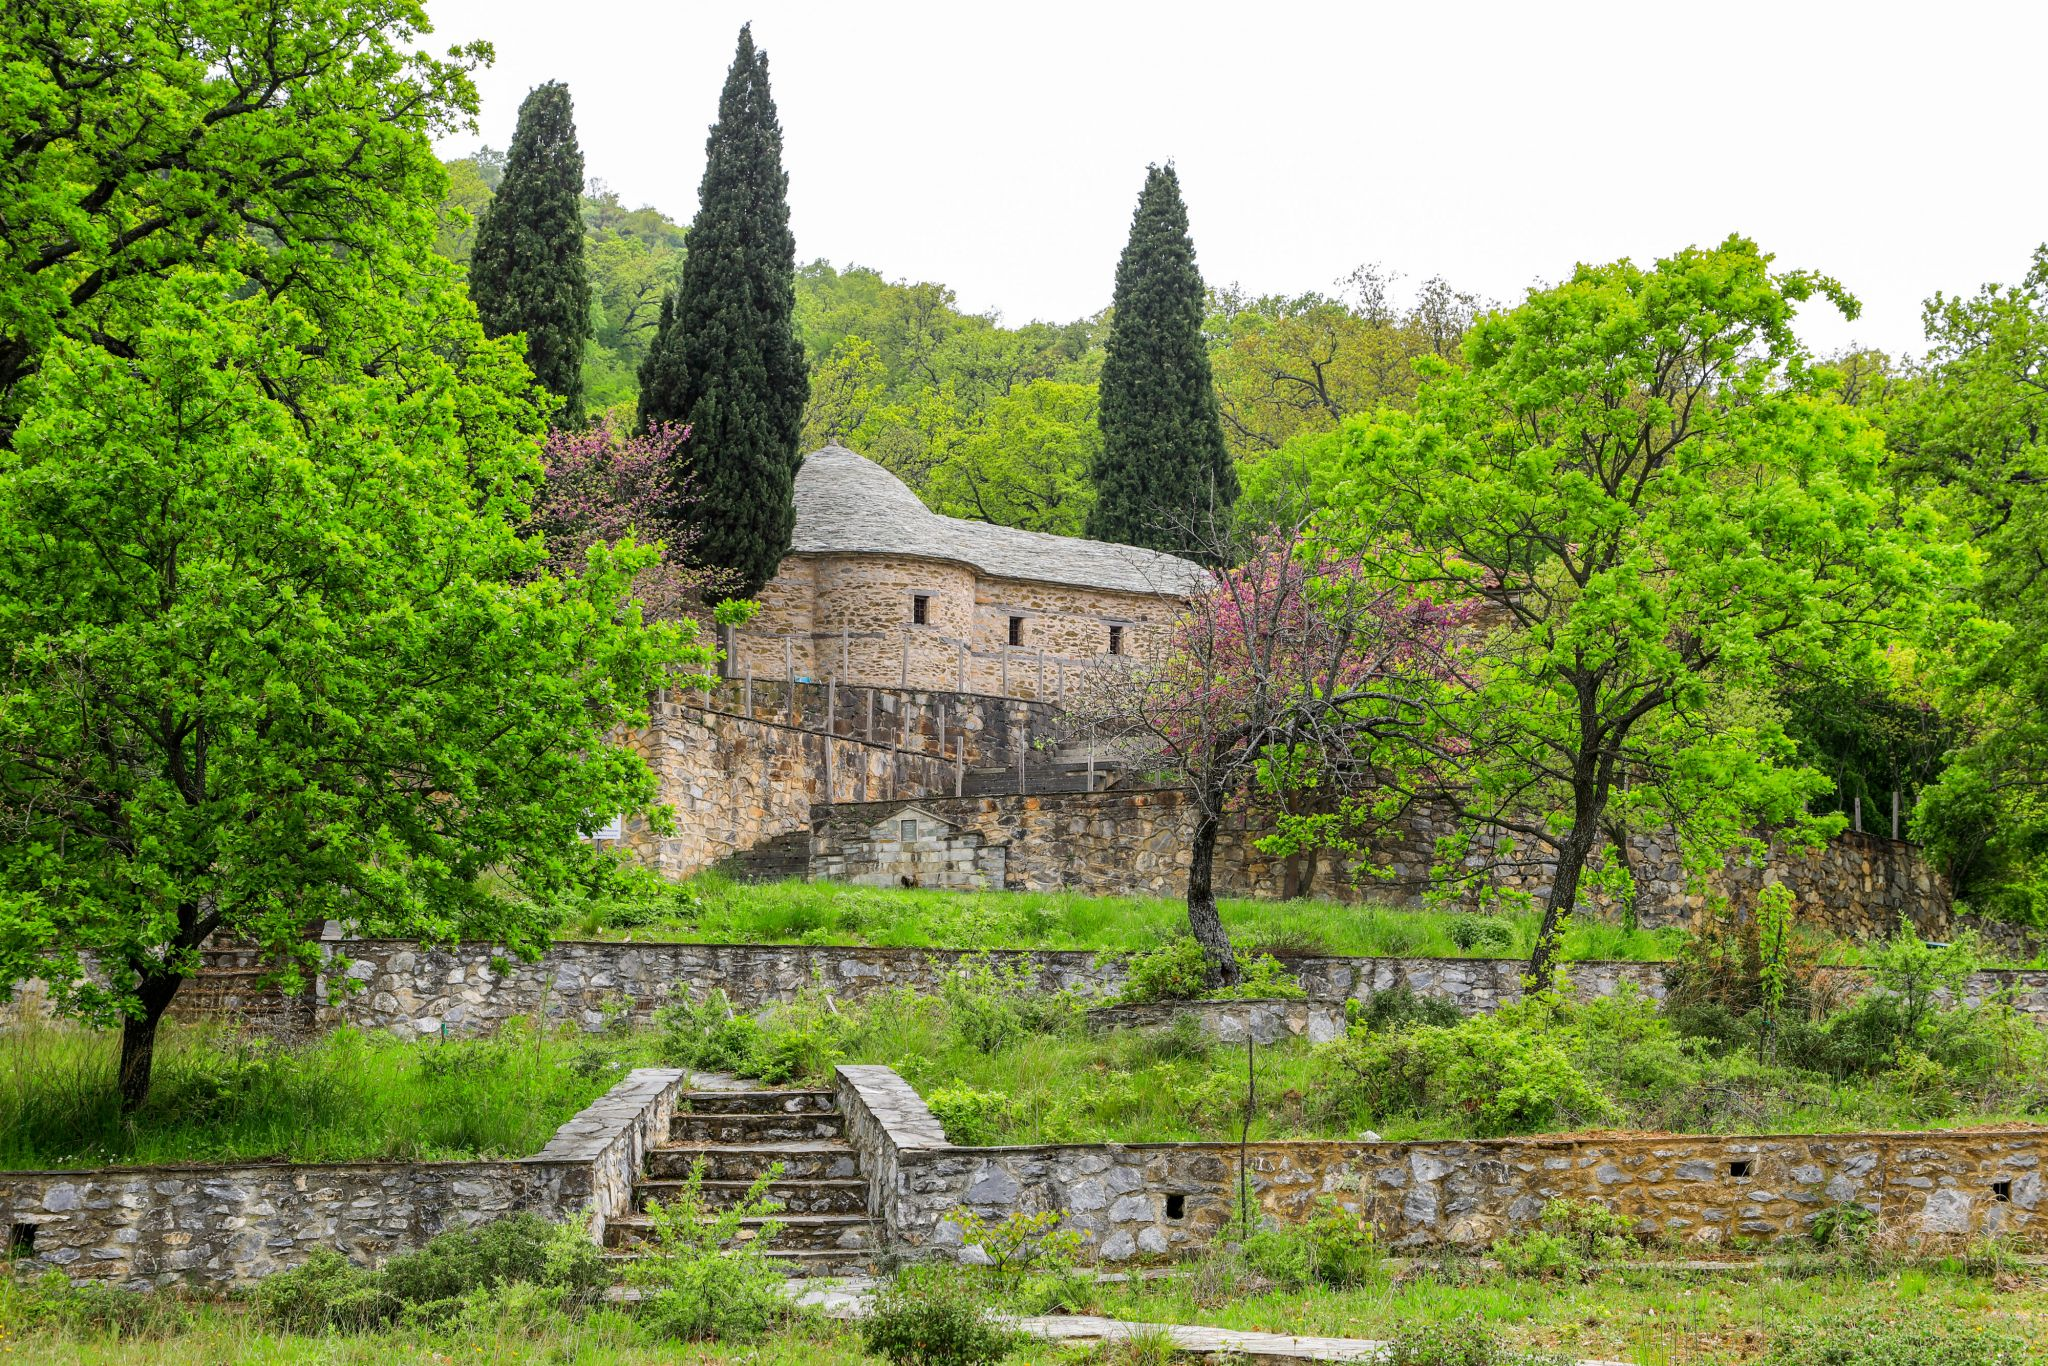 Agios Theodoros-Kloster, Greece